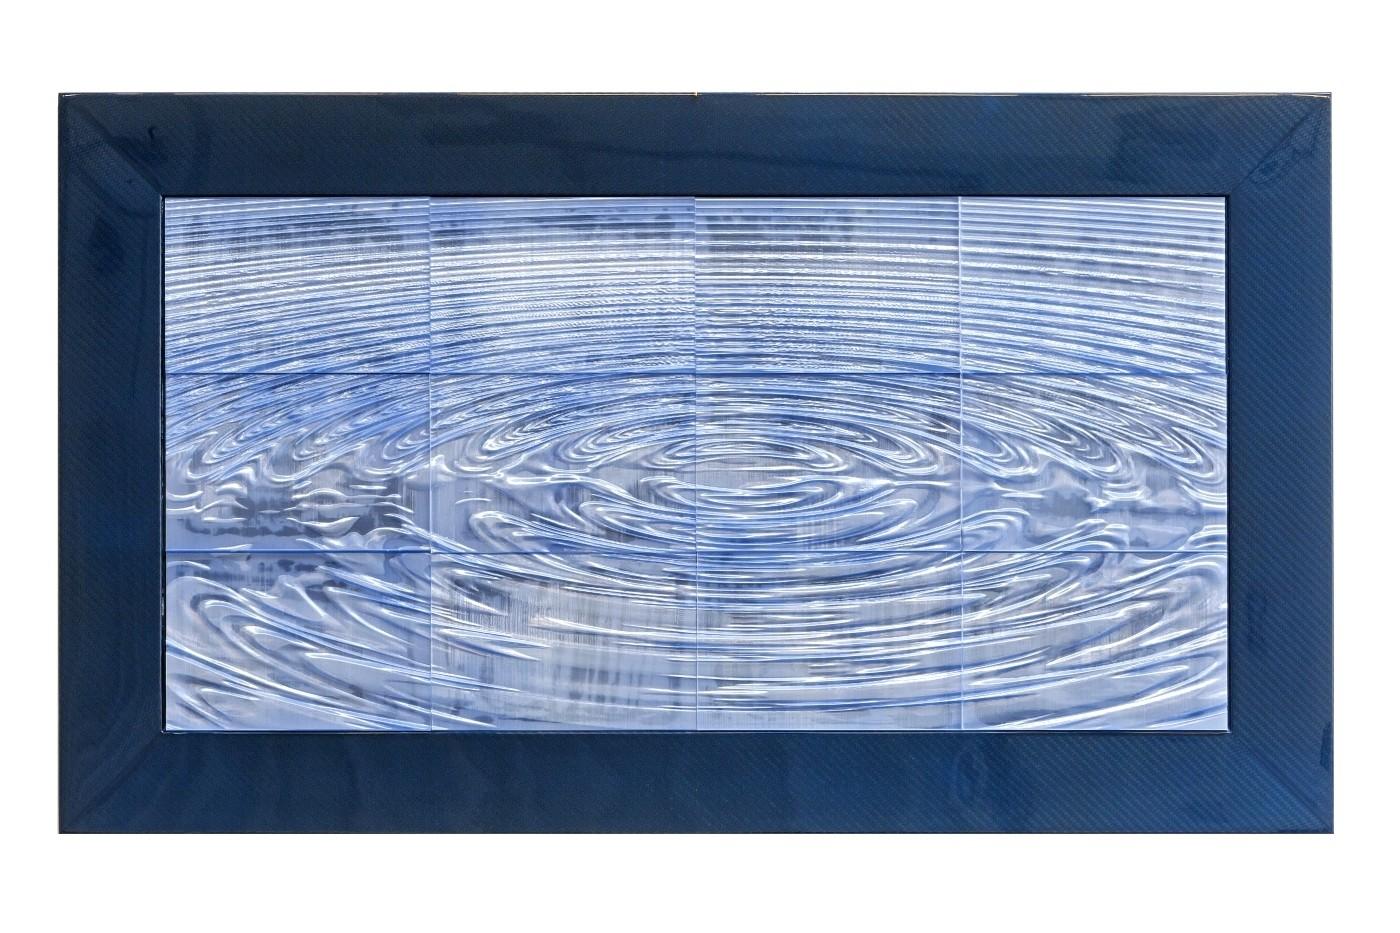 quadri 3d arredo casa Art 10 Quadro Relax cornice fibra carbonio